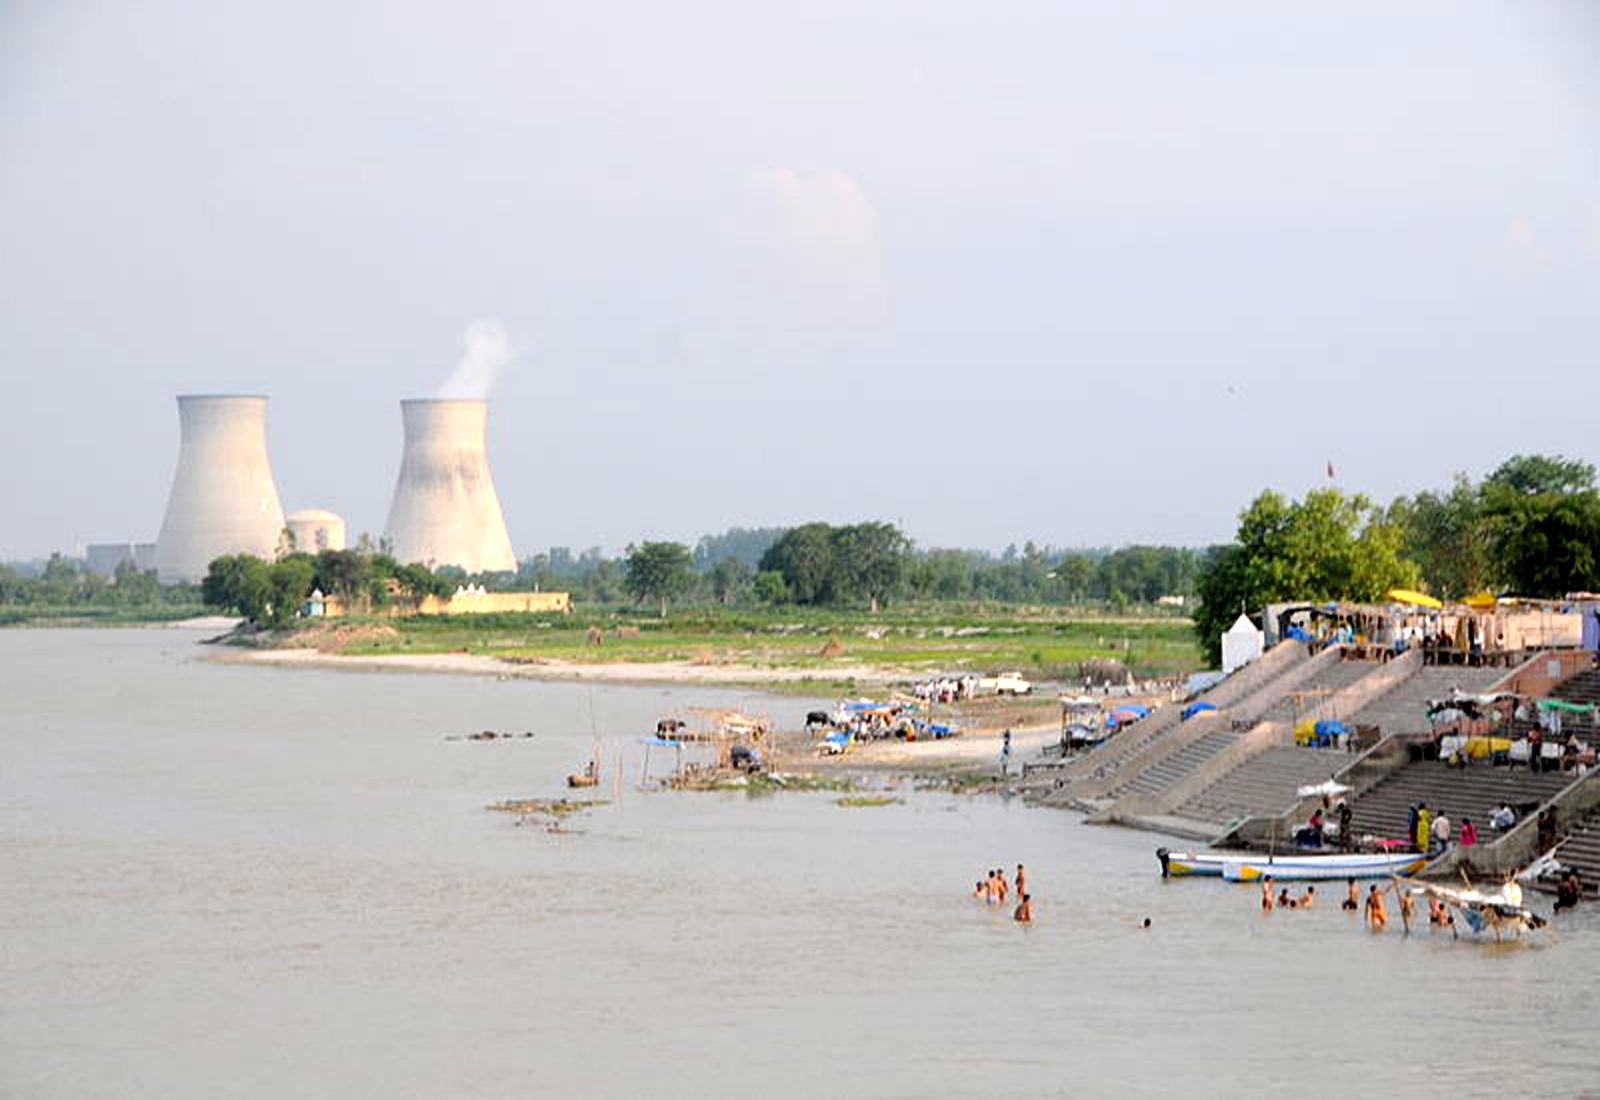 Image result for कृष्णा नदी का पानी धीरे धीरे जहरीला